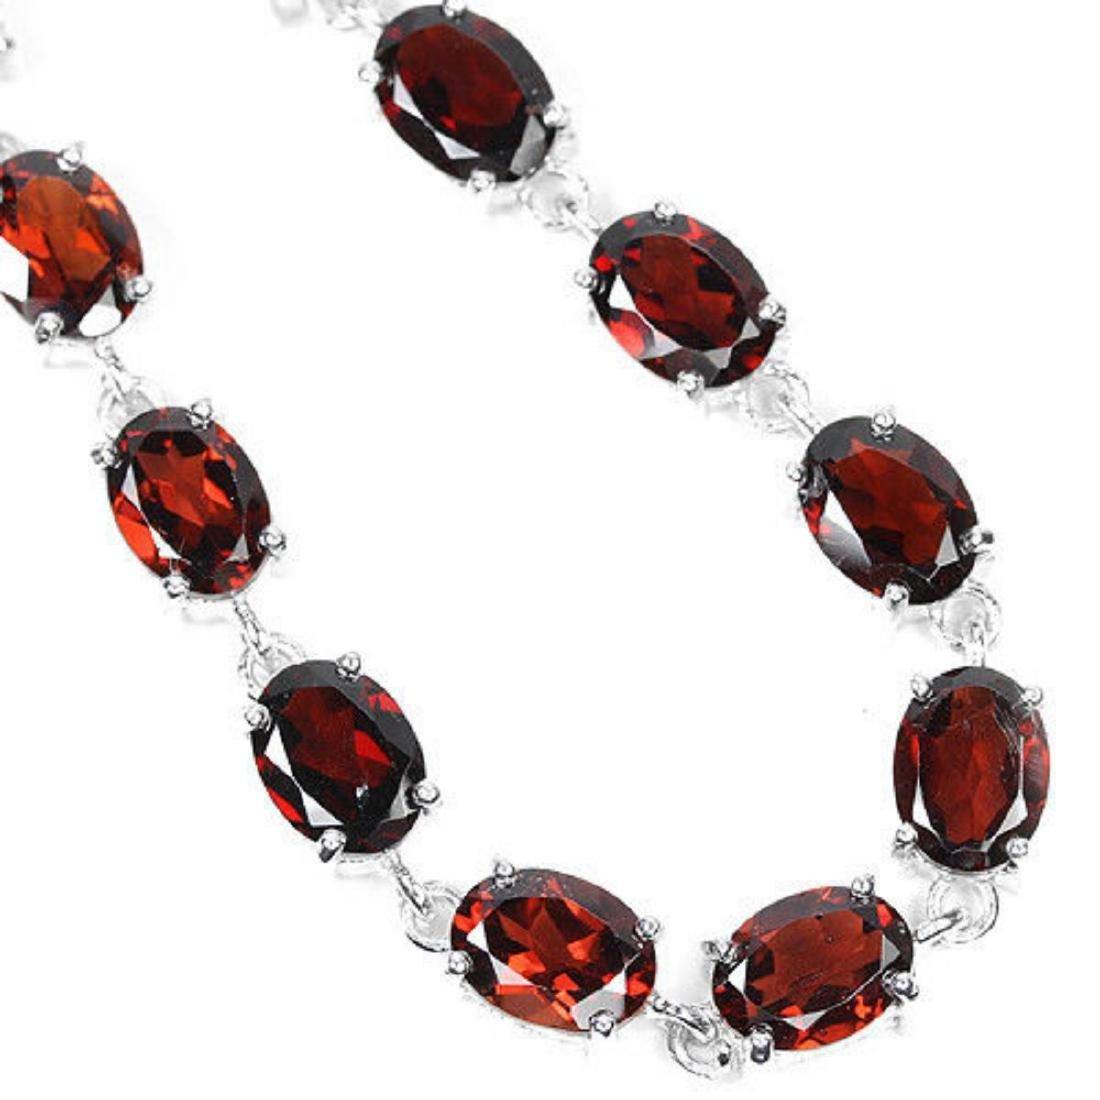 NATURAL AAA DRAK ORANGE RED GARNET Bracelet - 2